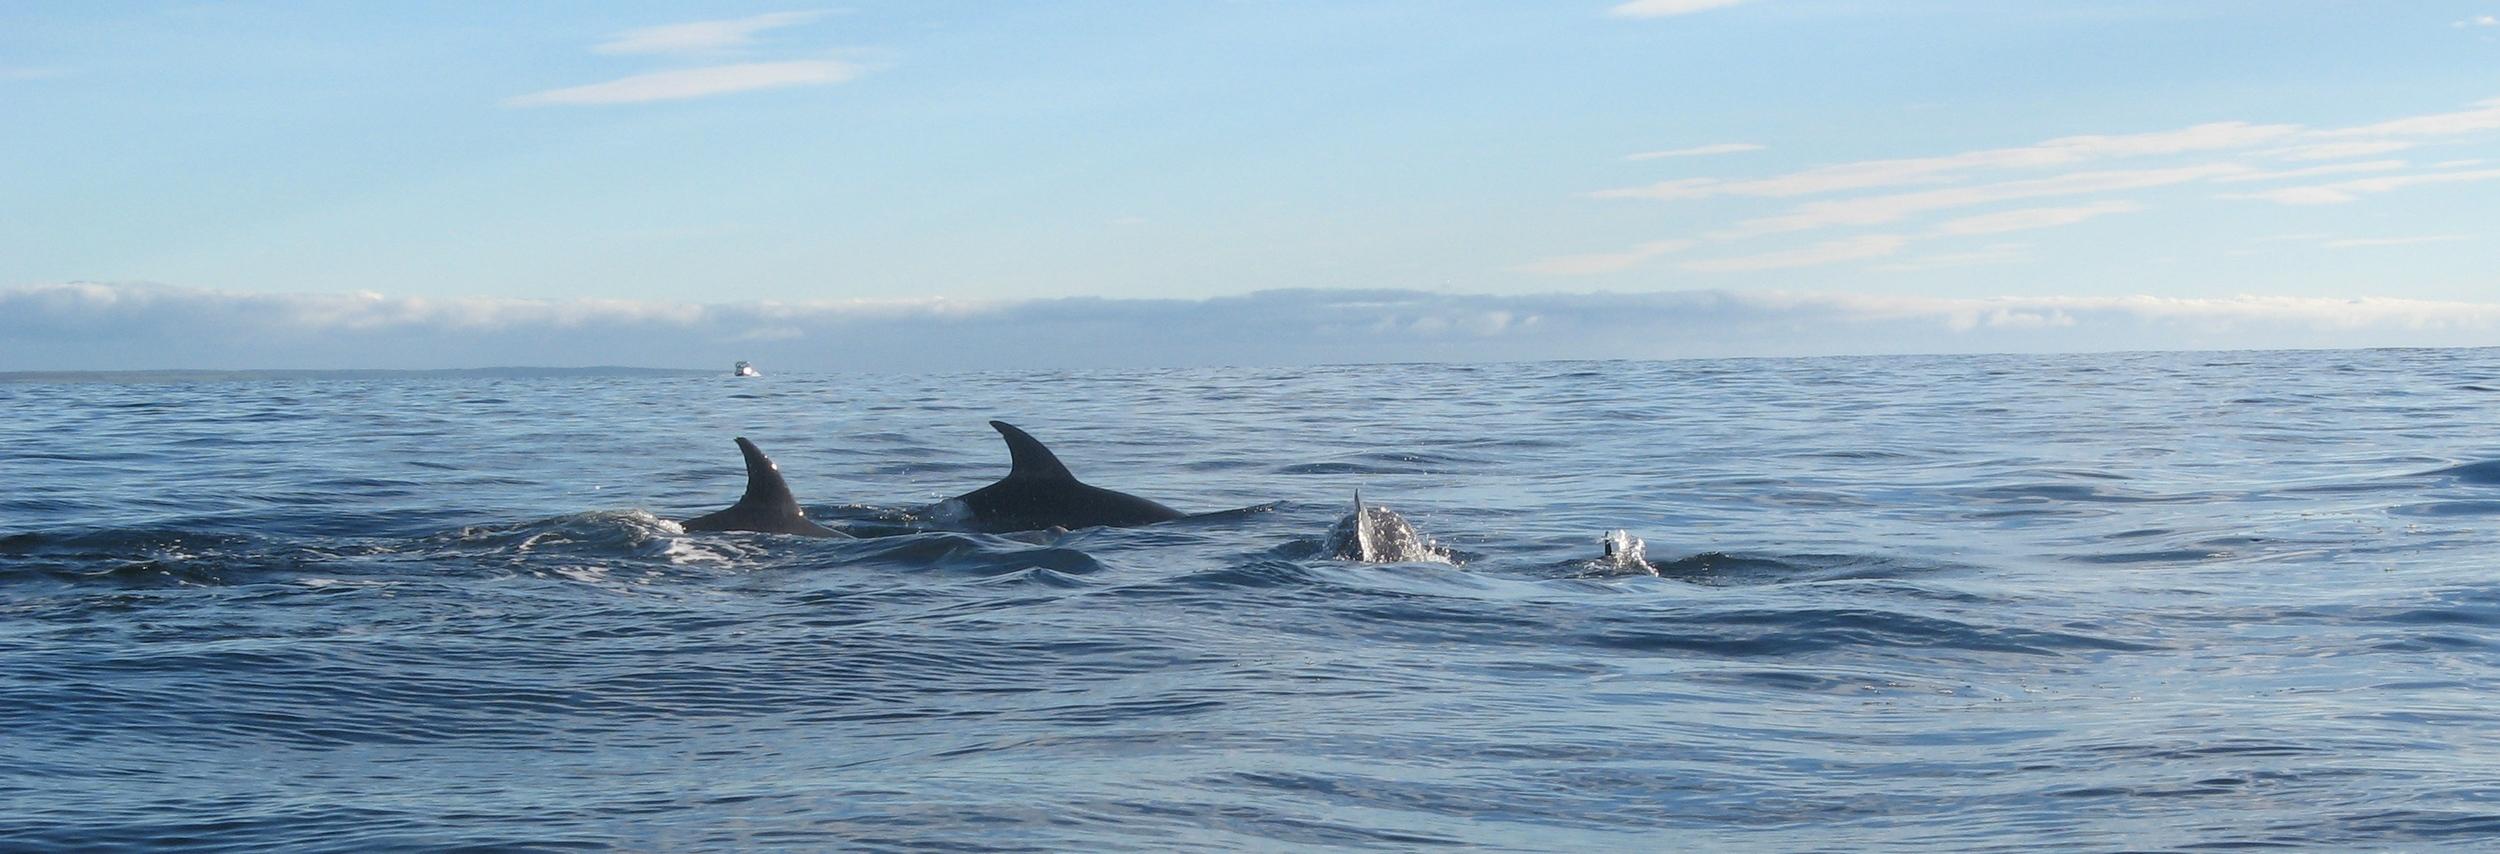 Abundant sealife